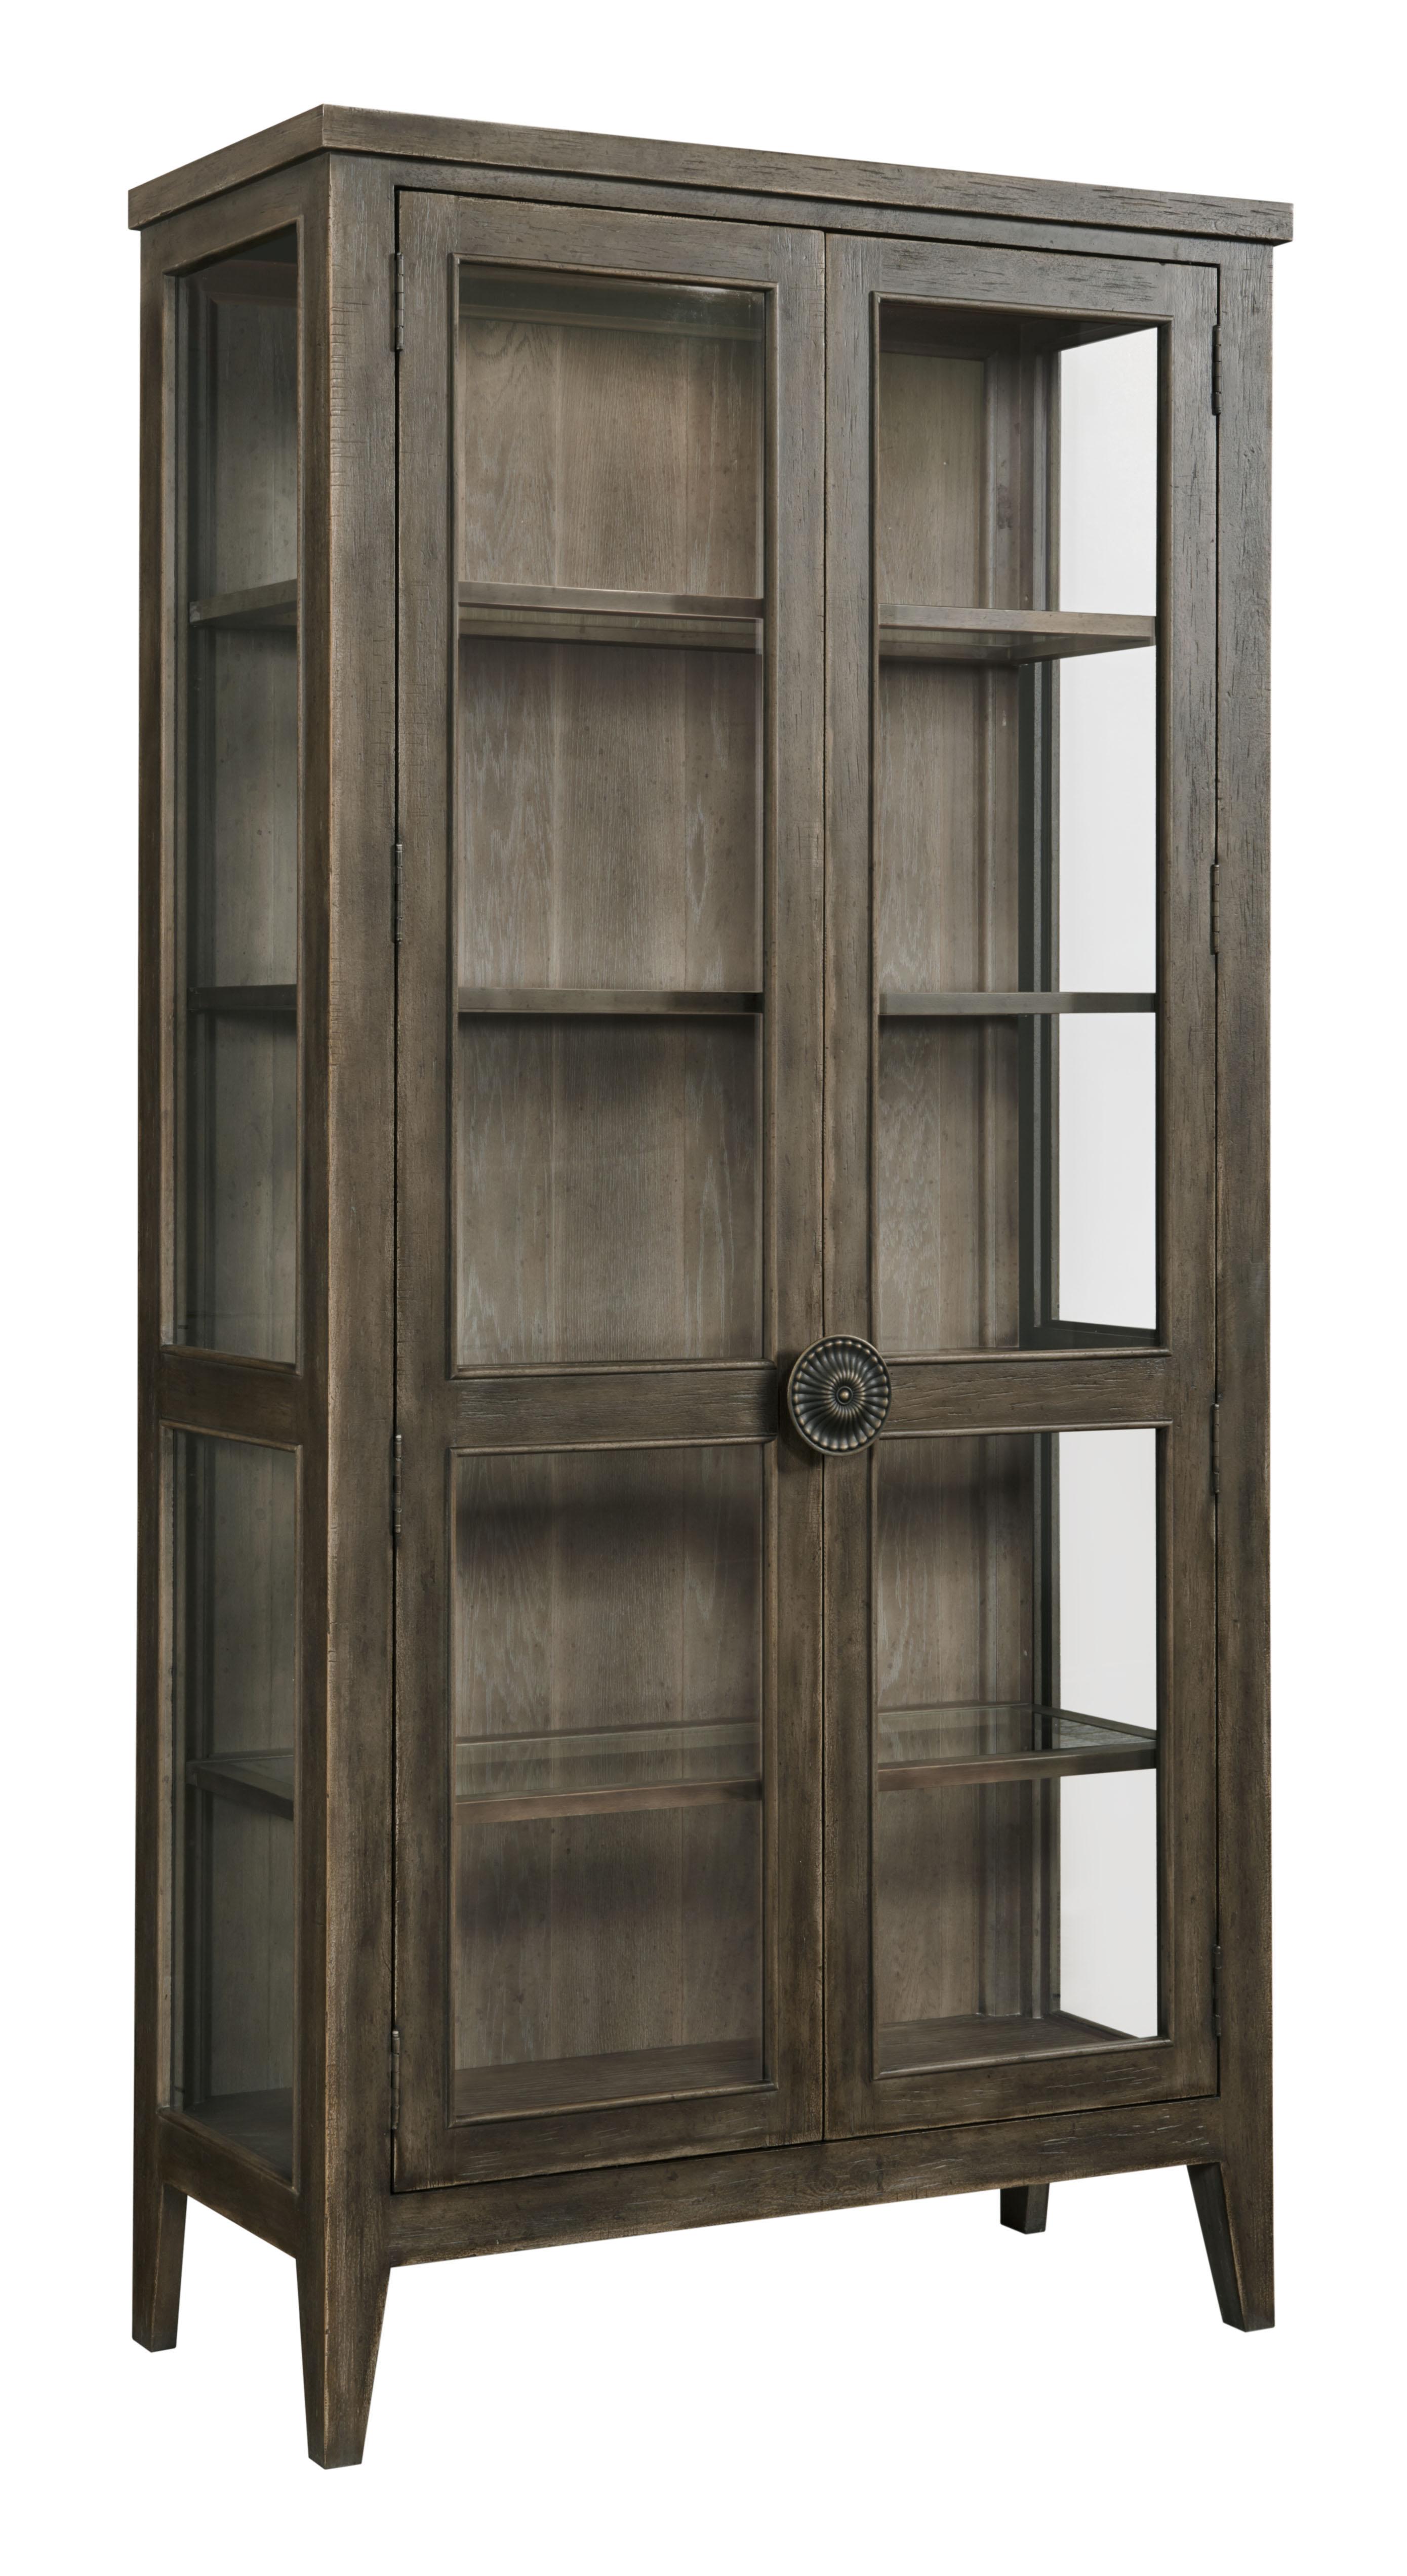 Emporium Cabinet by American Drew at Stoney Creek Furniture